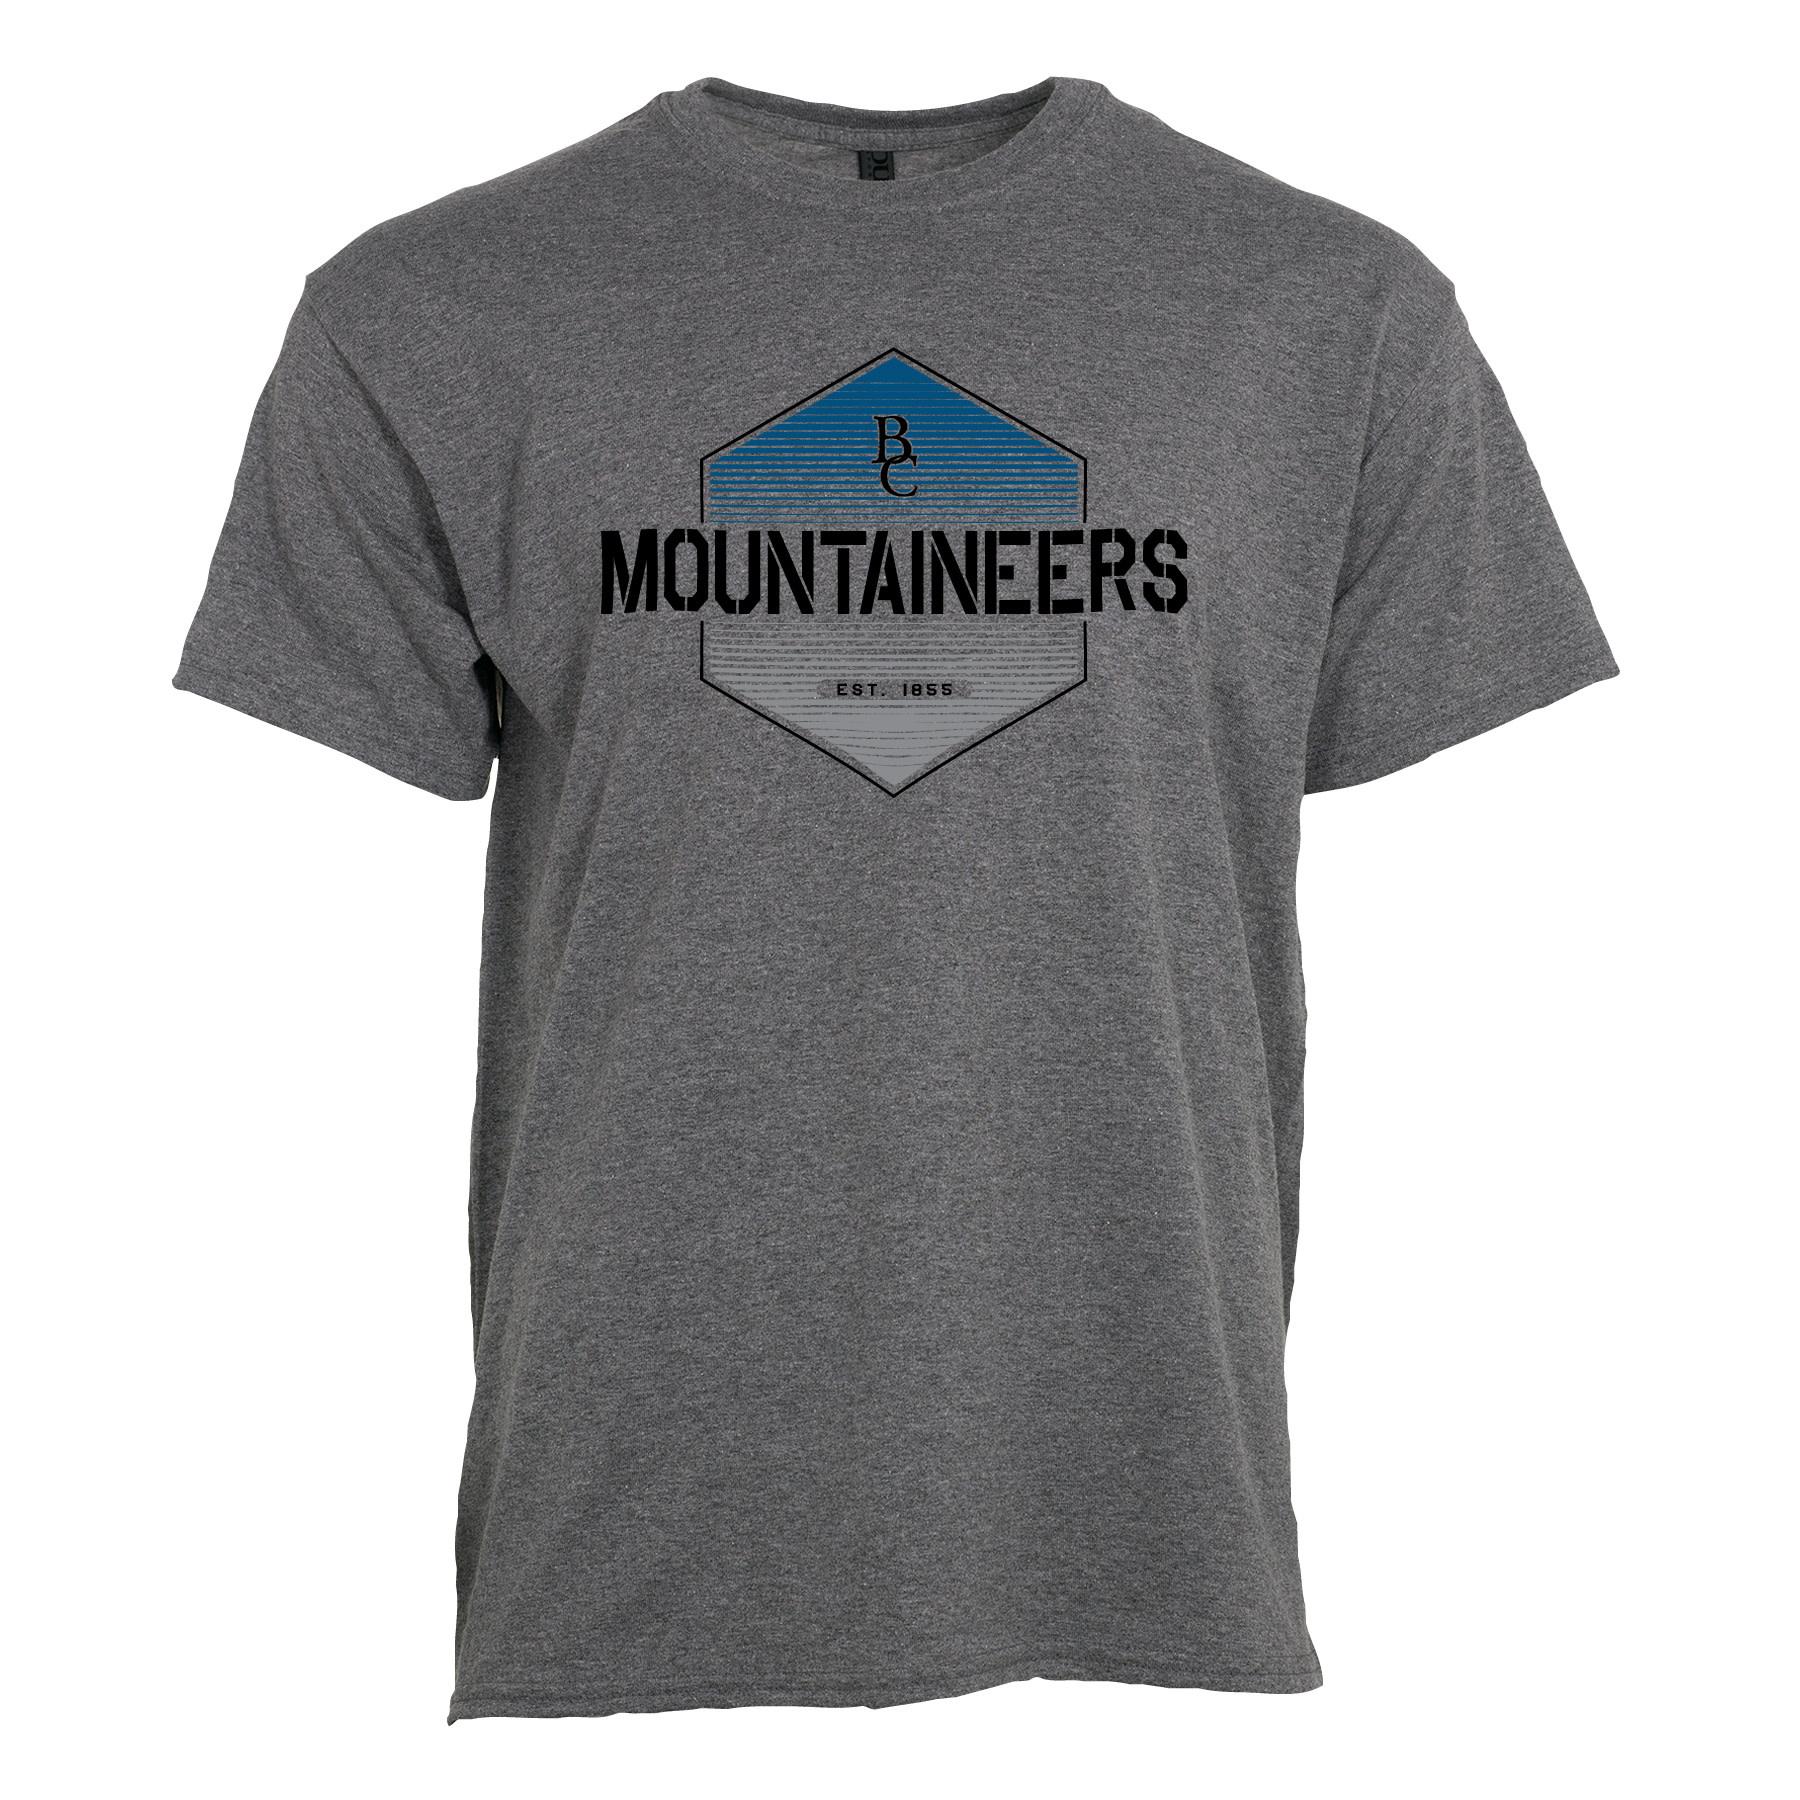 Hexagon BC Mountaineers Est. 1855 T-Shirt-1